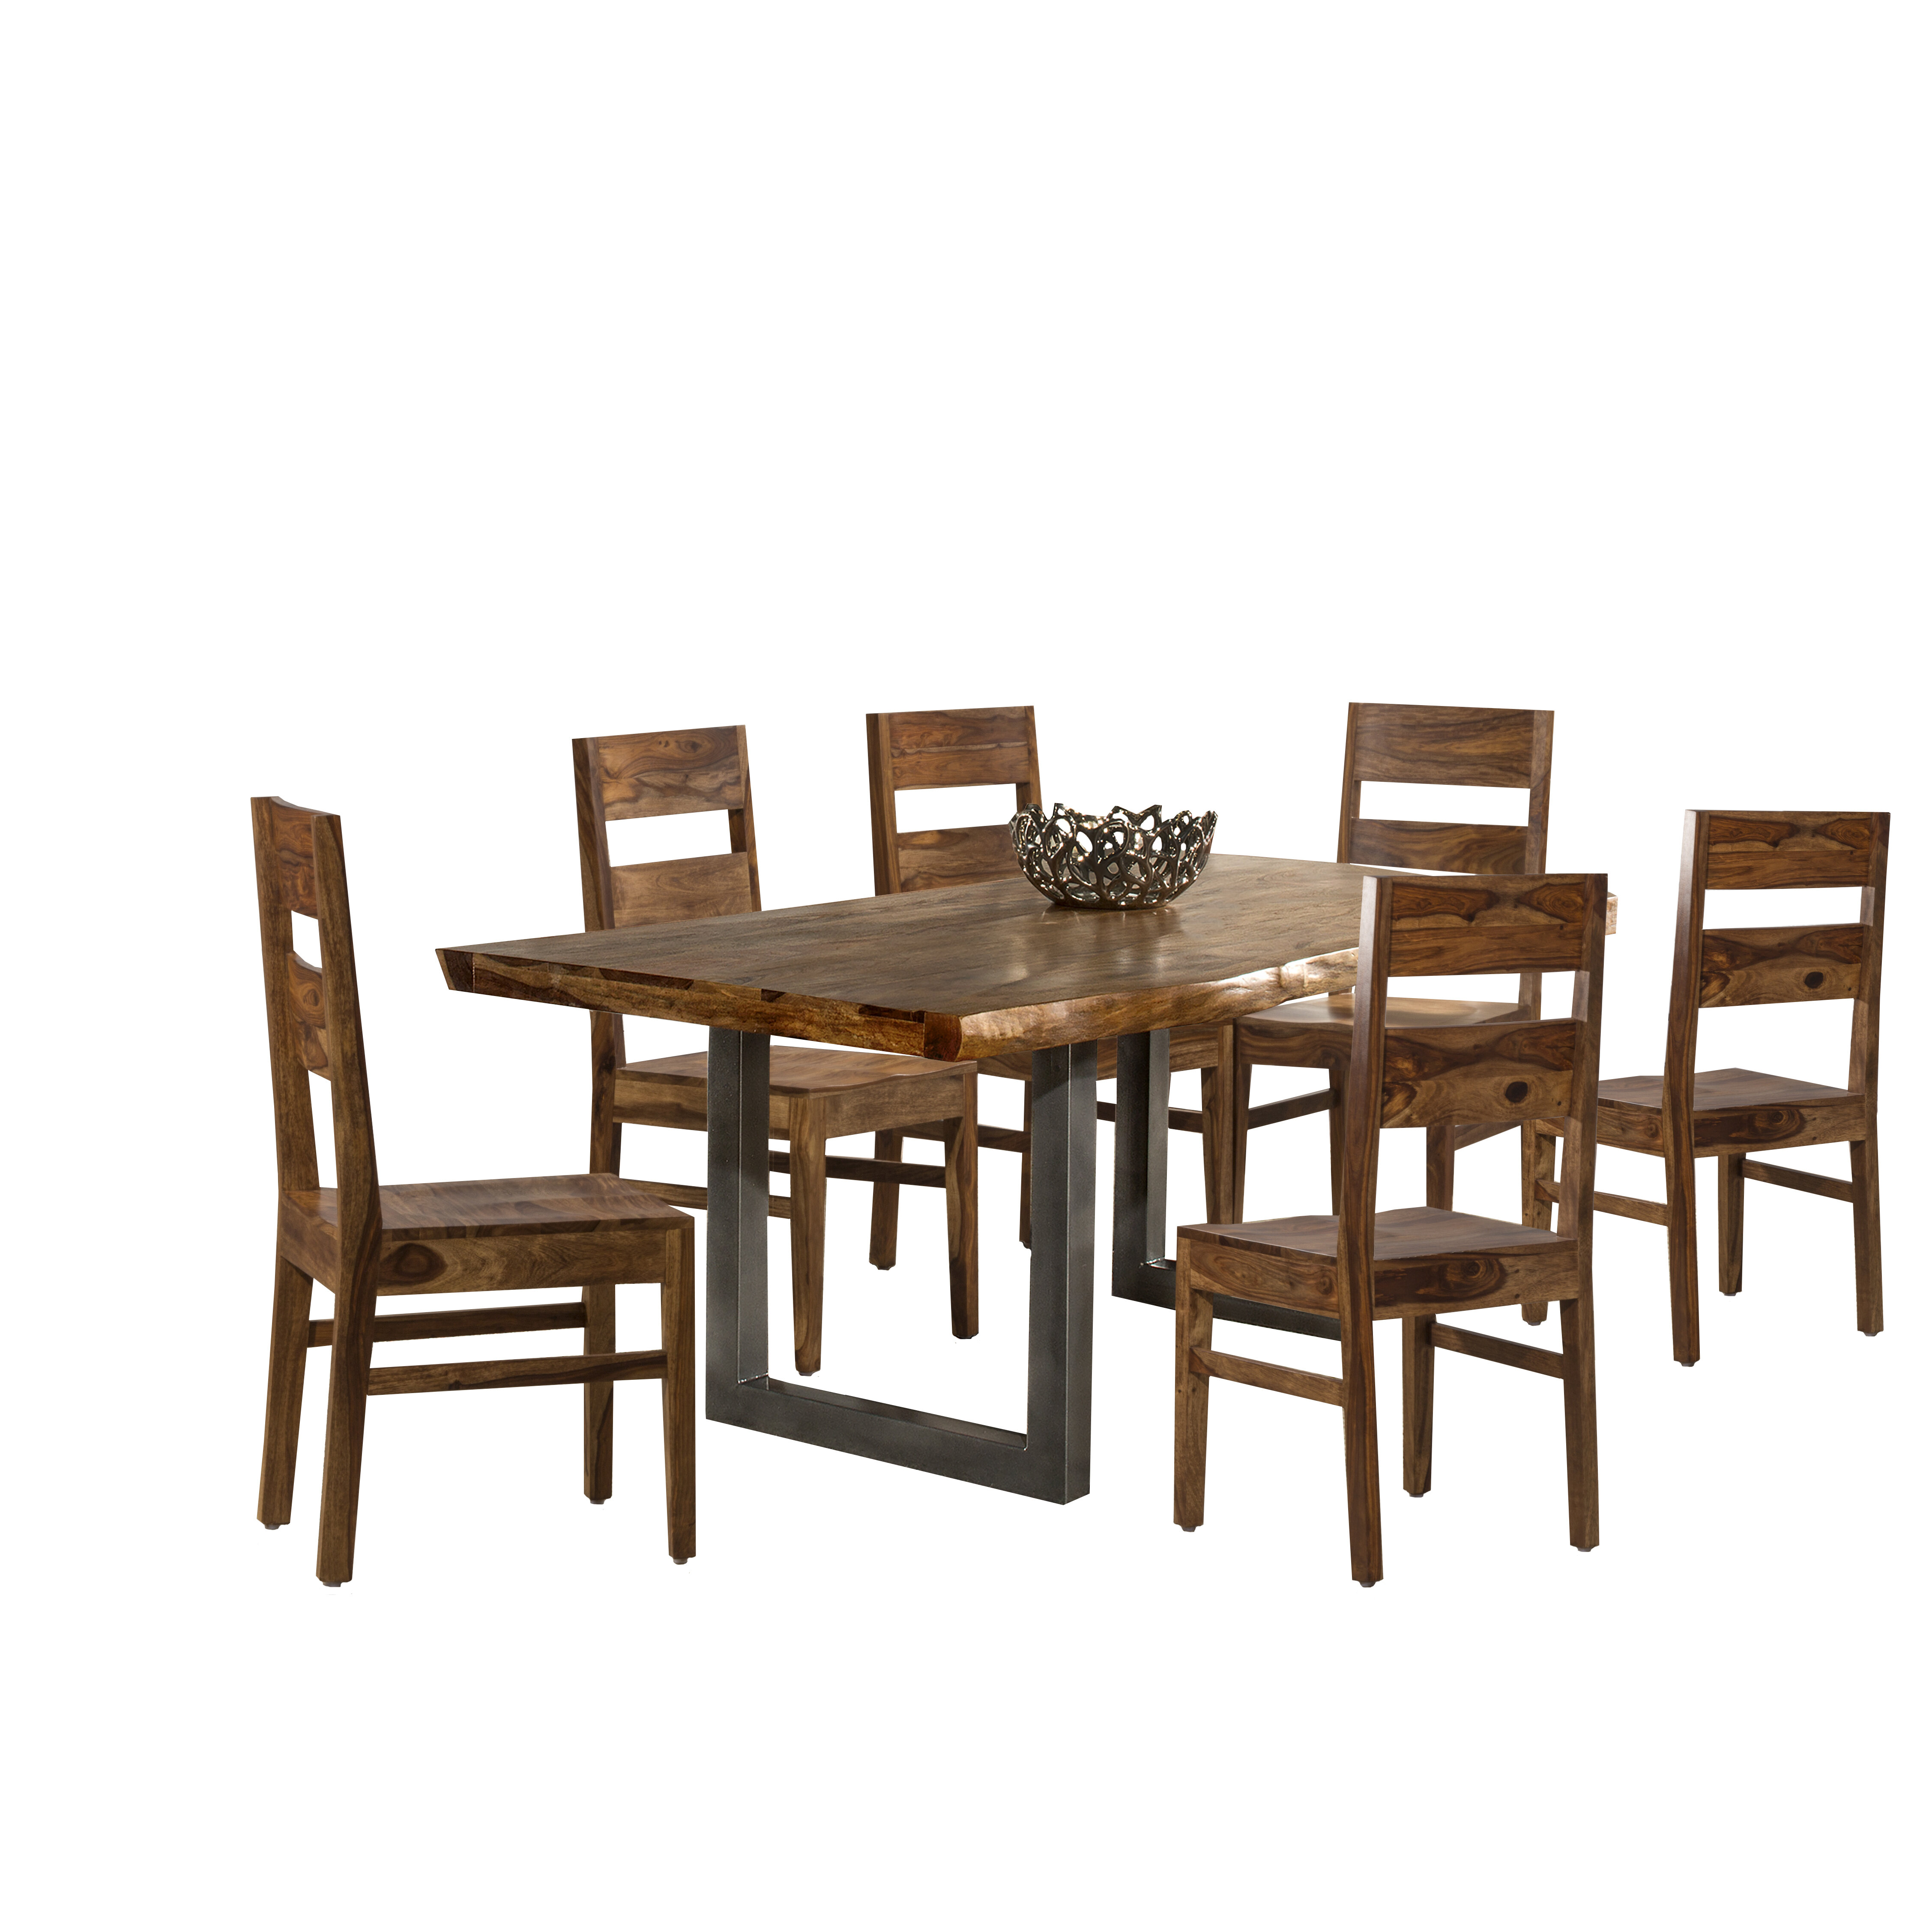 Mistana Lonan 7 Piece Solid Wood Dining Set Reviews Wayfair